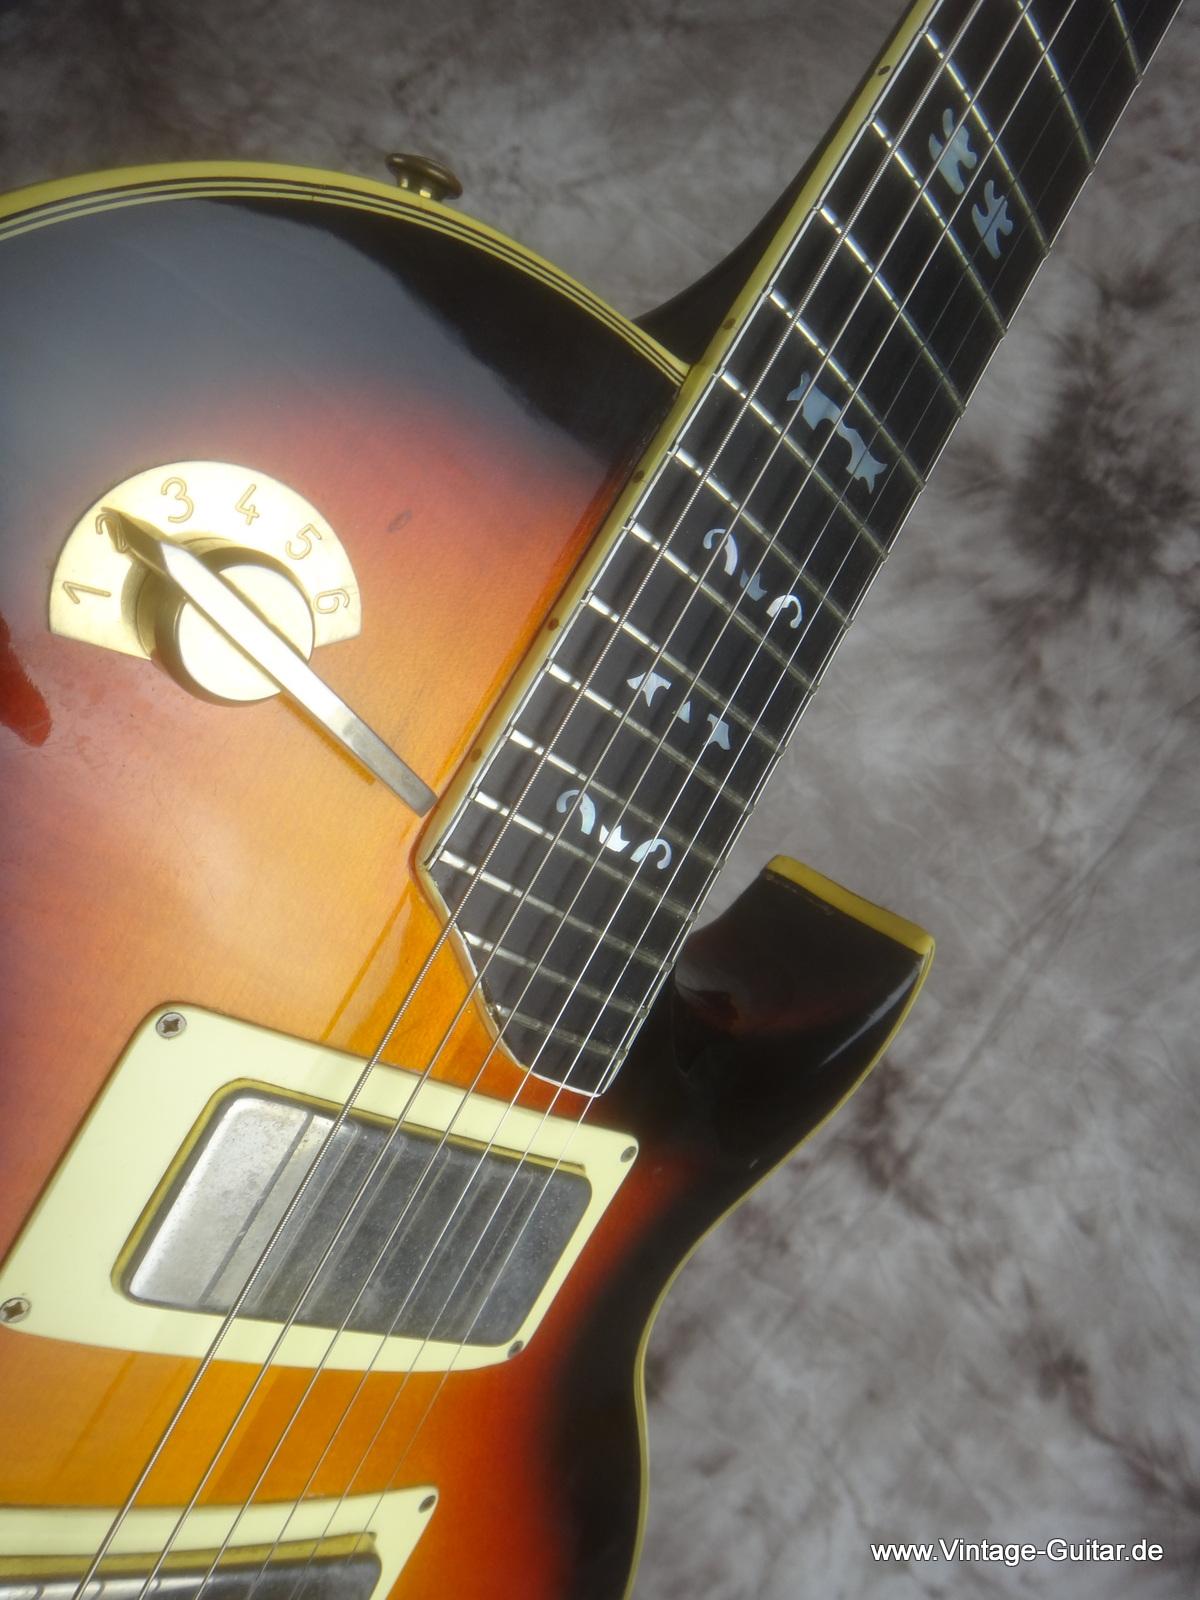 framus jan akkerman 1979 sunburst guitar for sale vintage guitar oldenburg